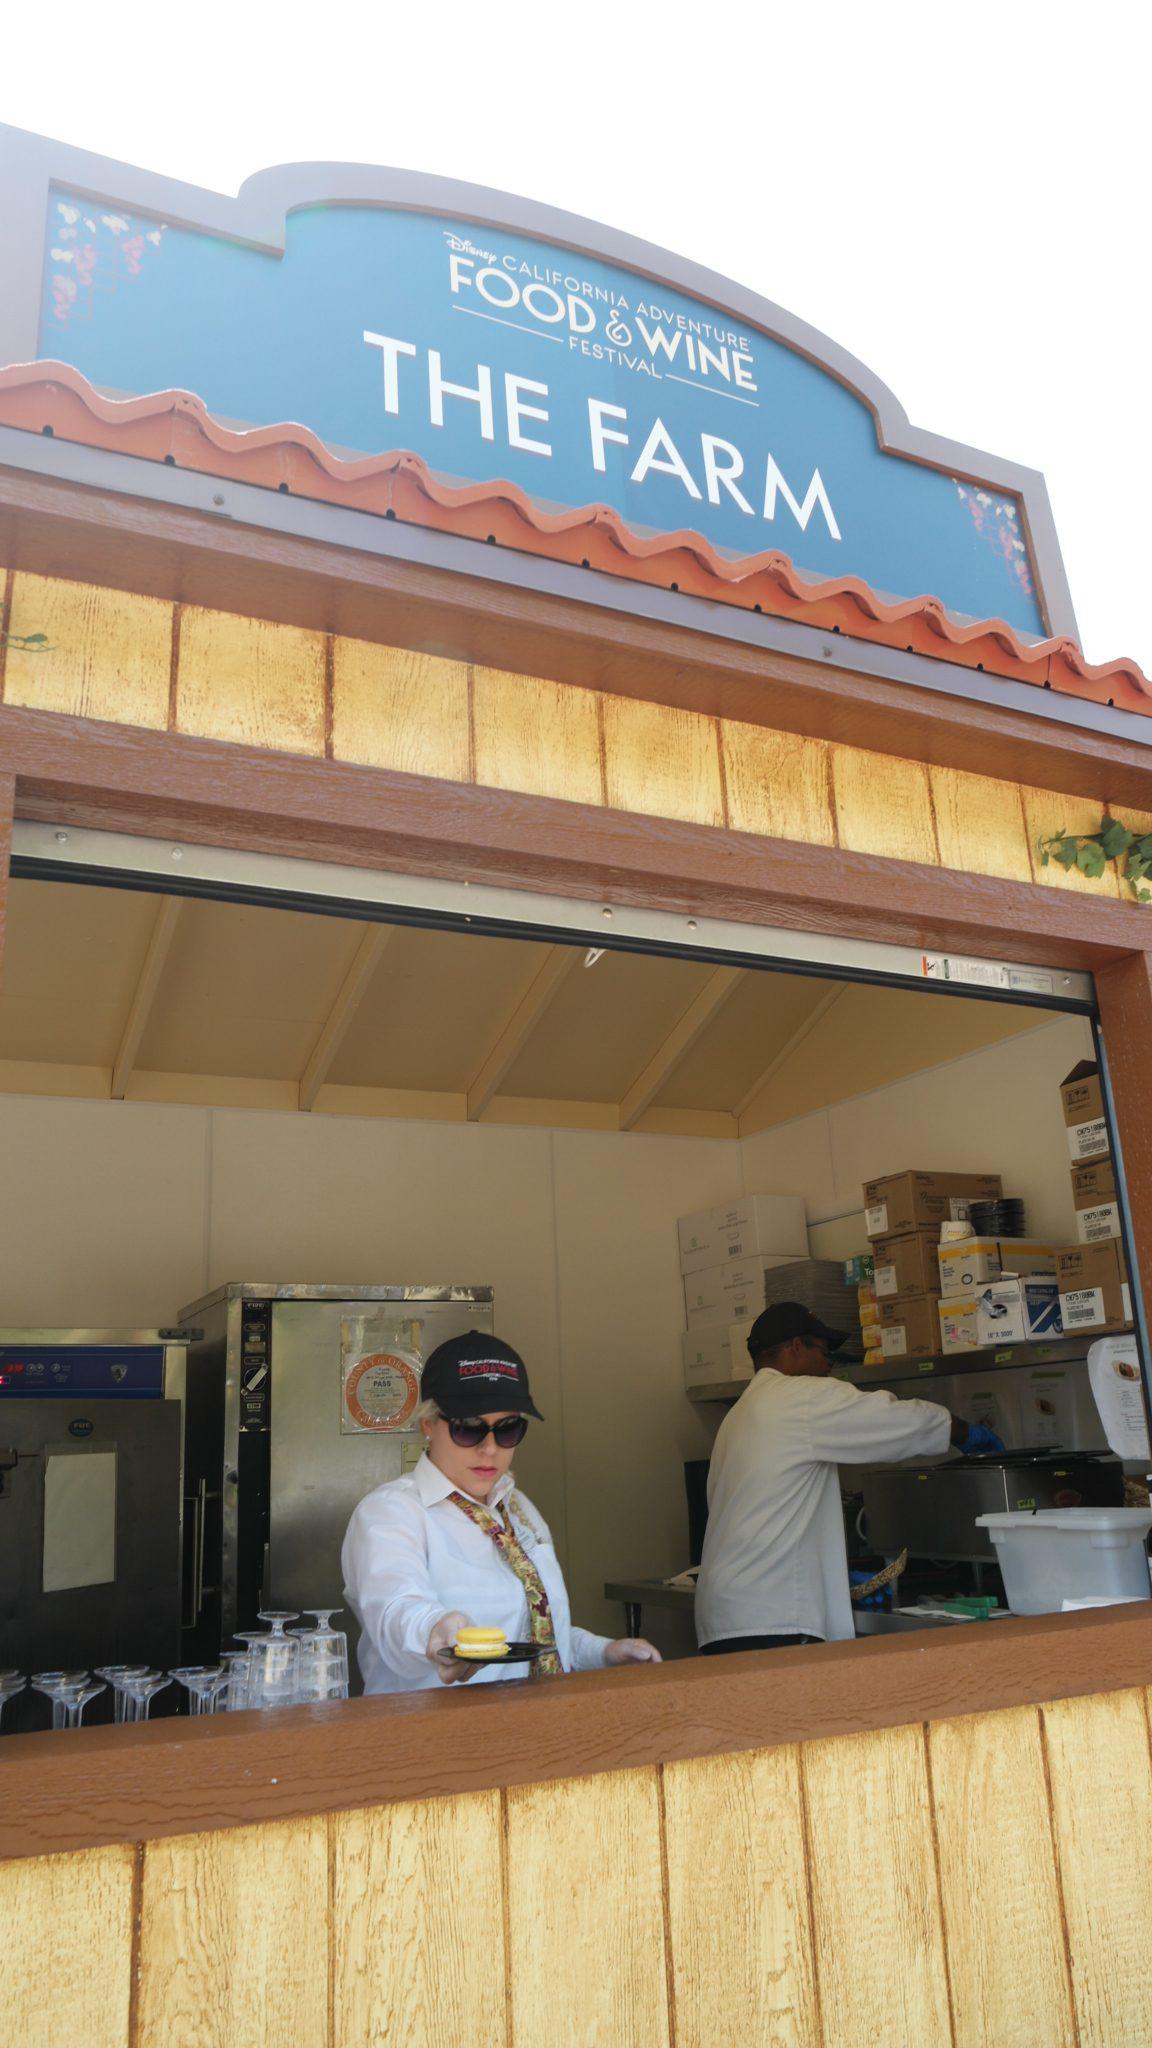 The Farm Marketplace